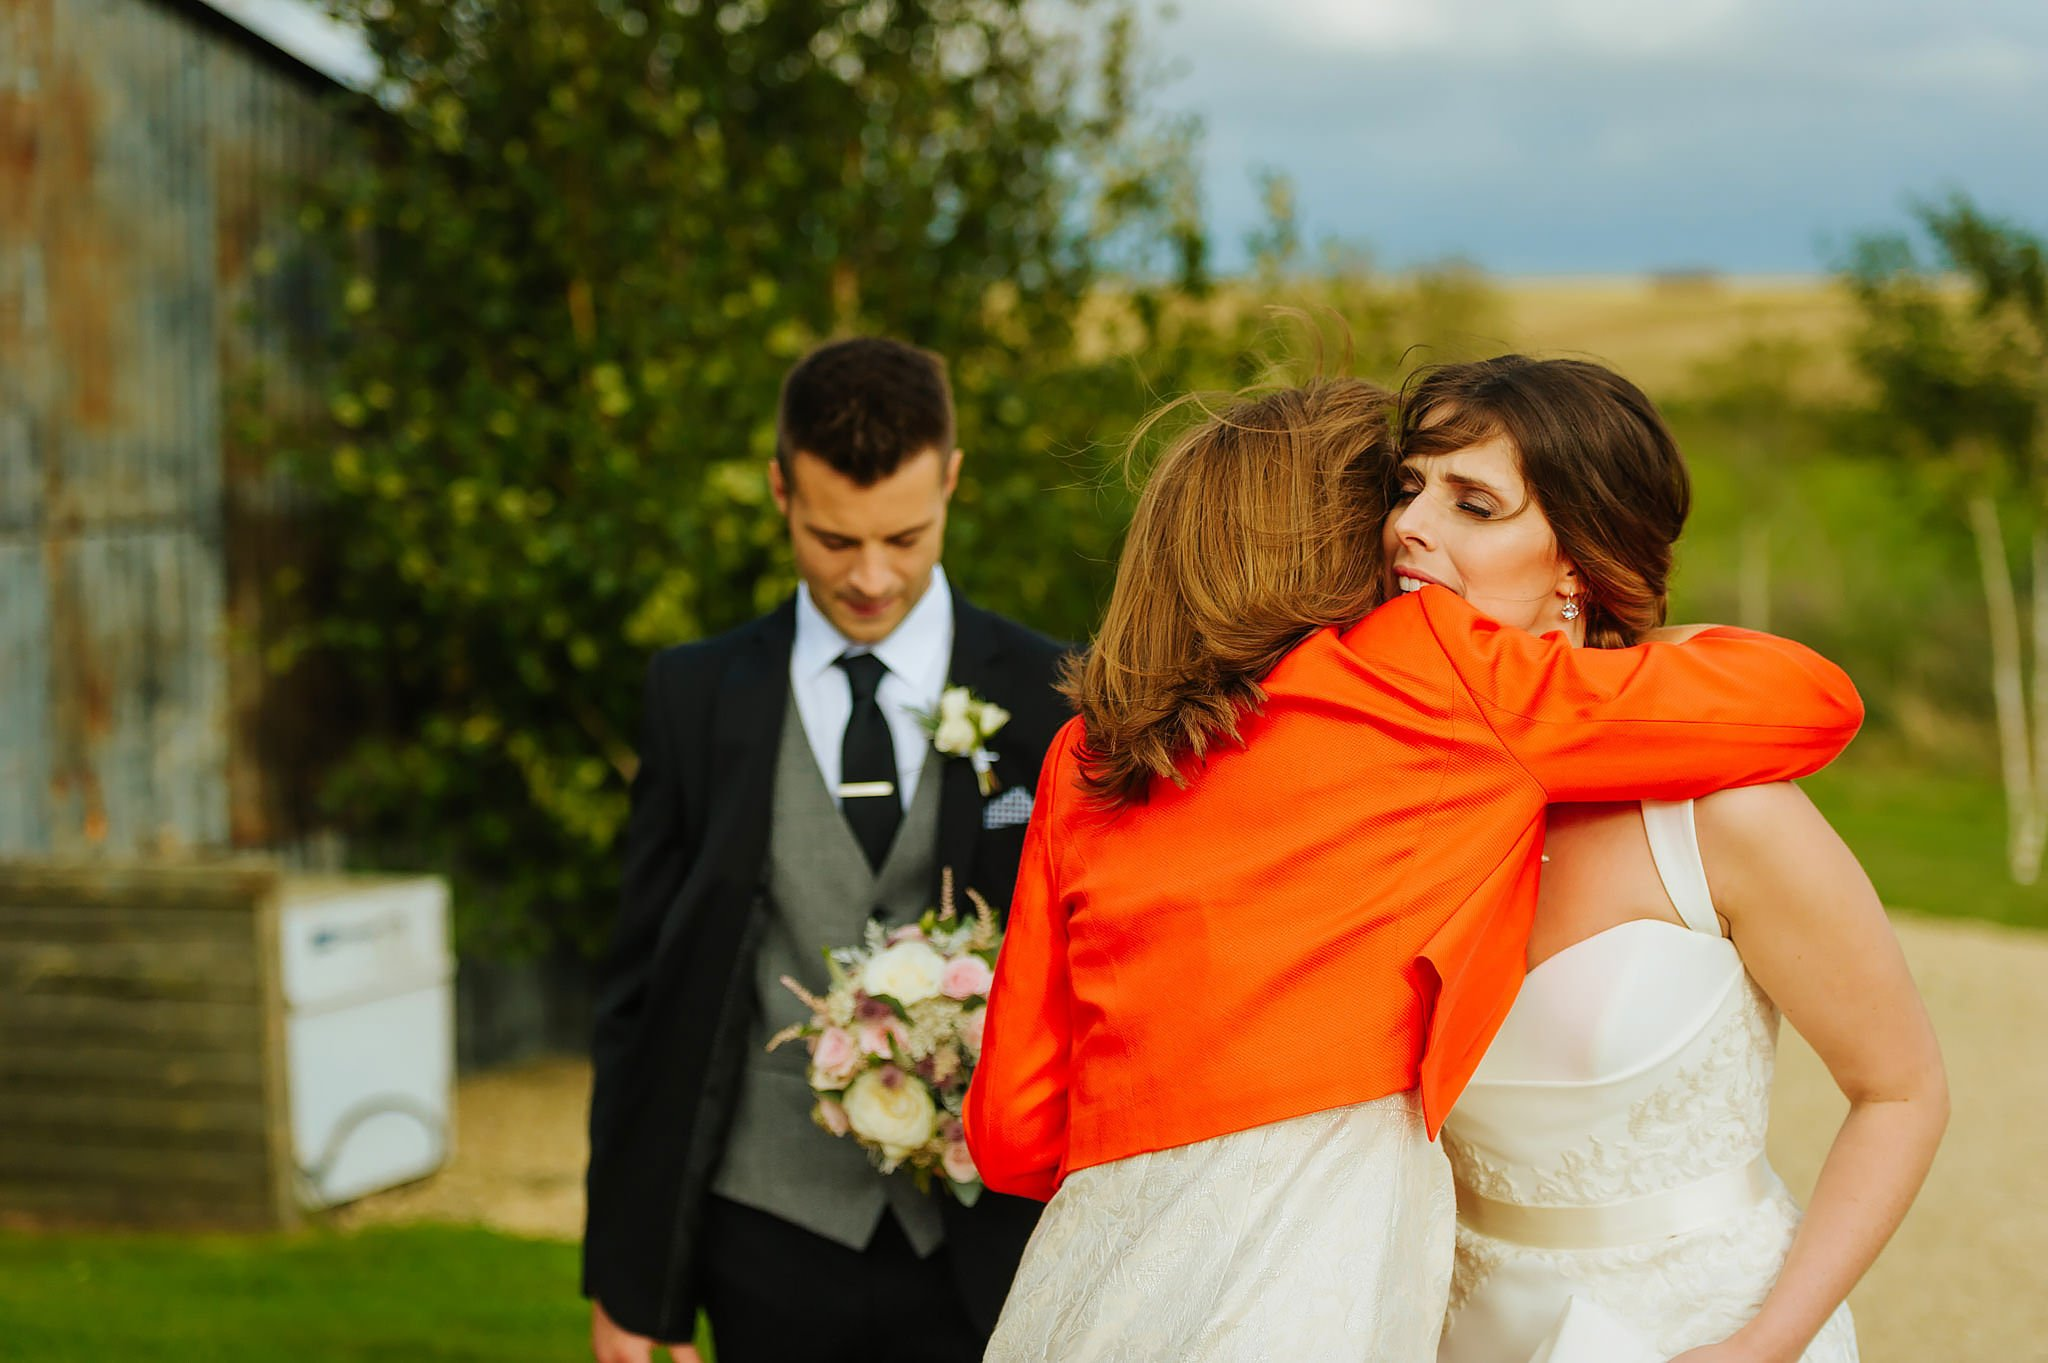 stone-barn-wedding-cotswolds (83)